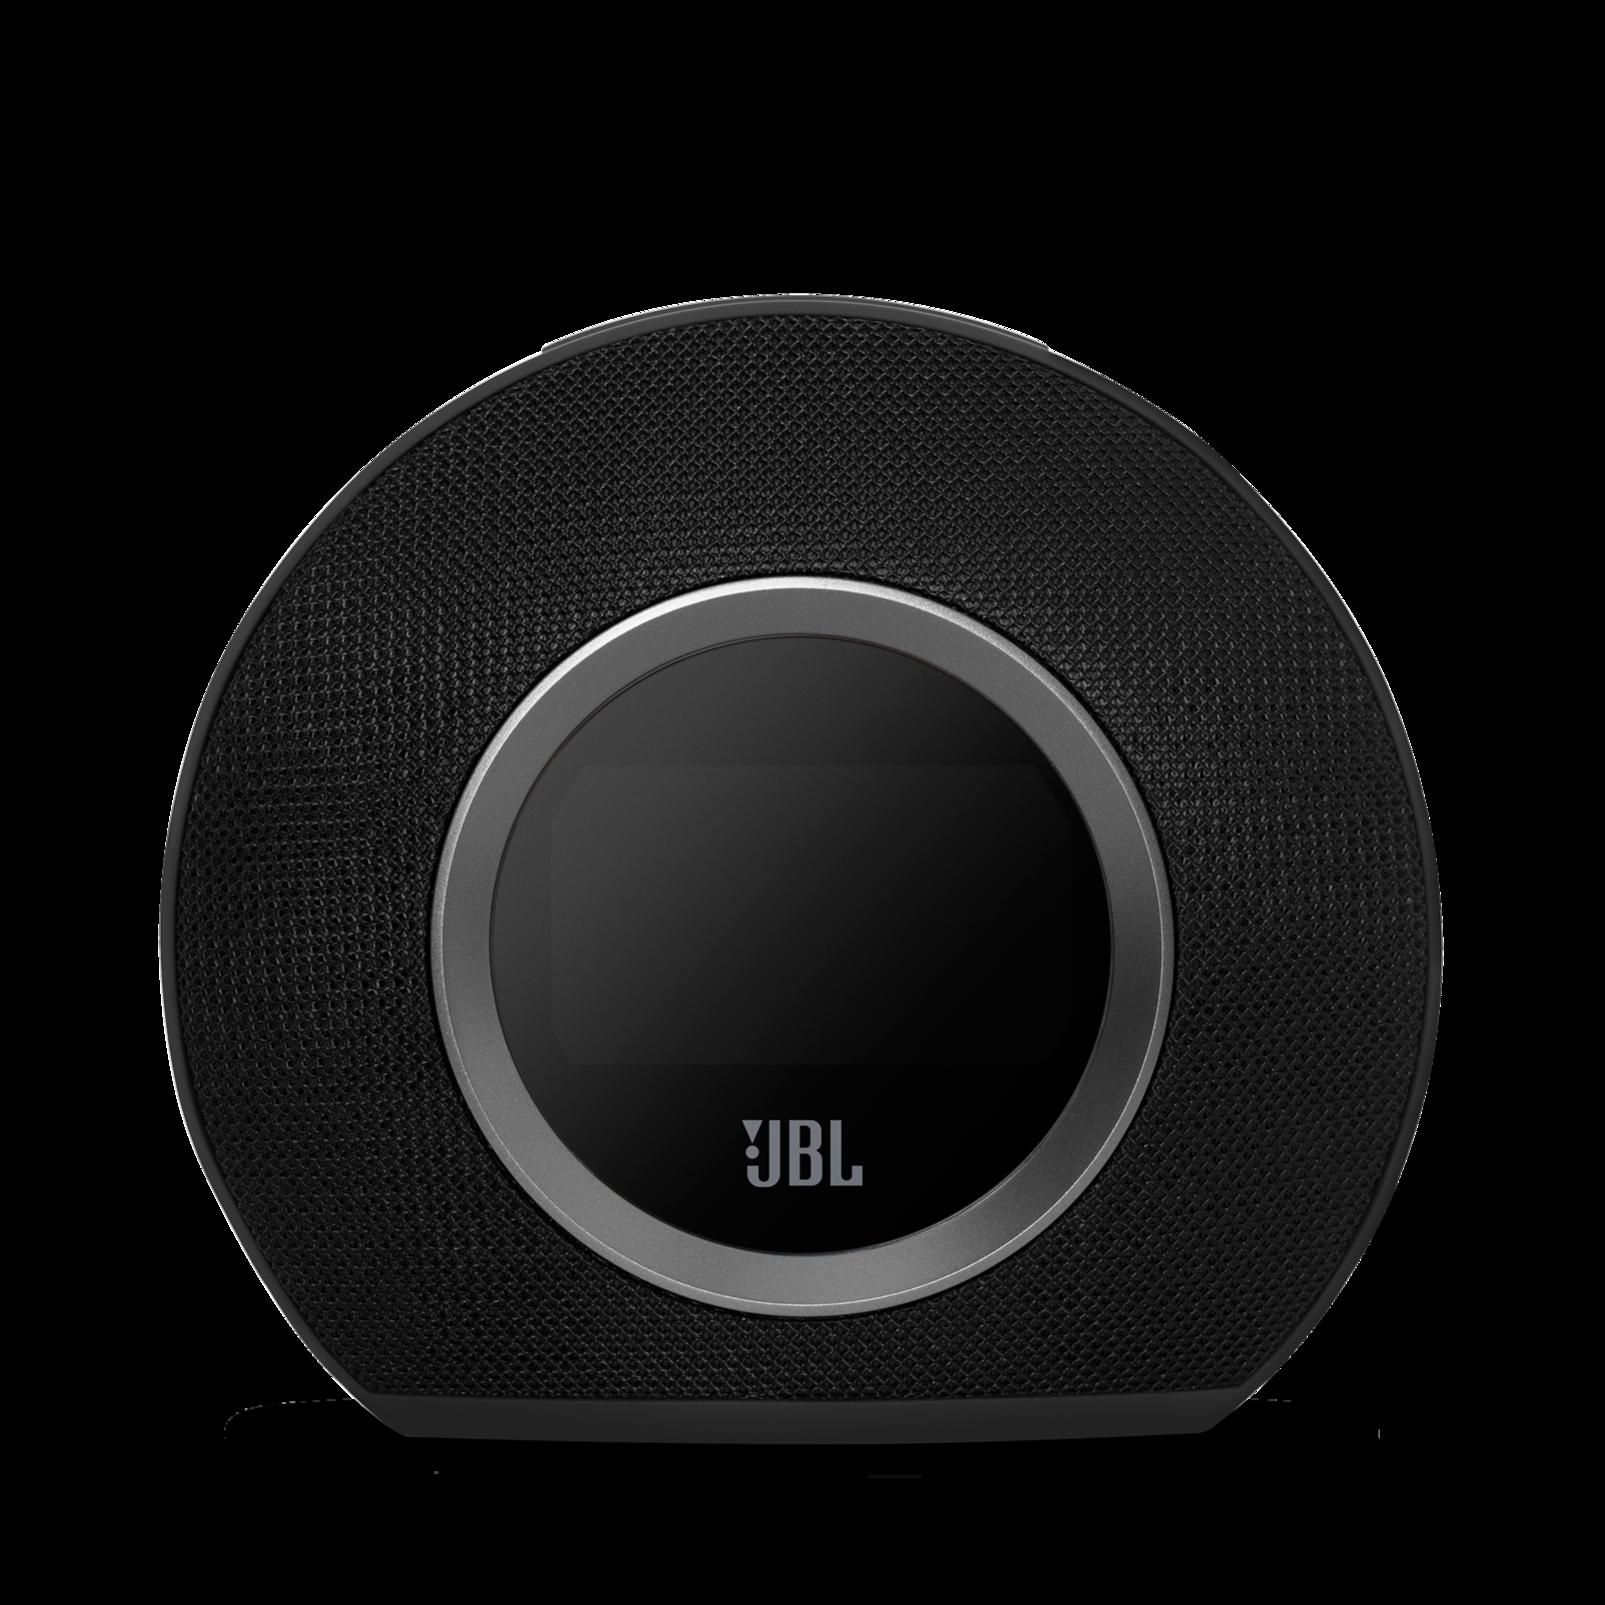 jbl horizon bluetooth alarm clock radio  usb chargers ambient light